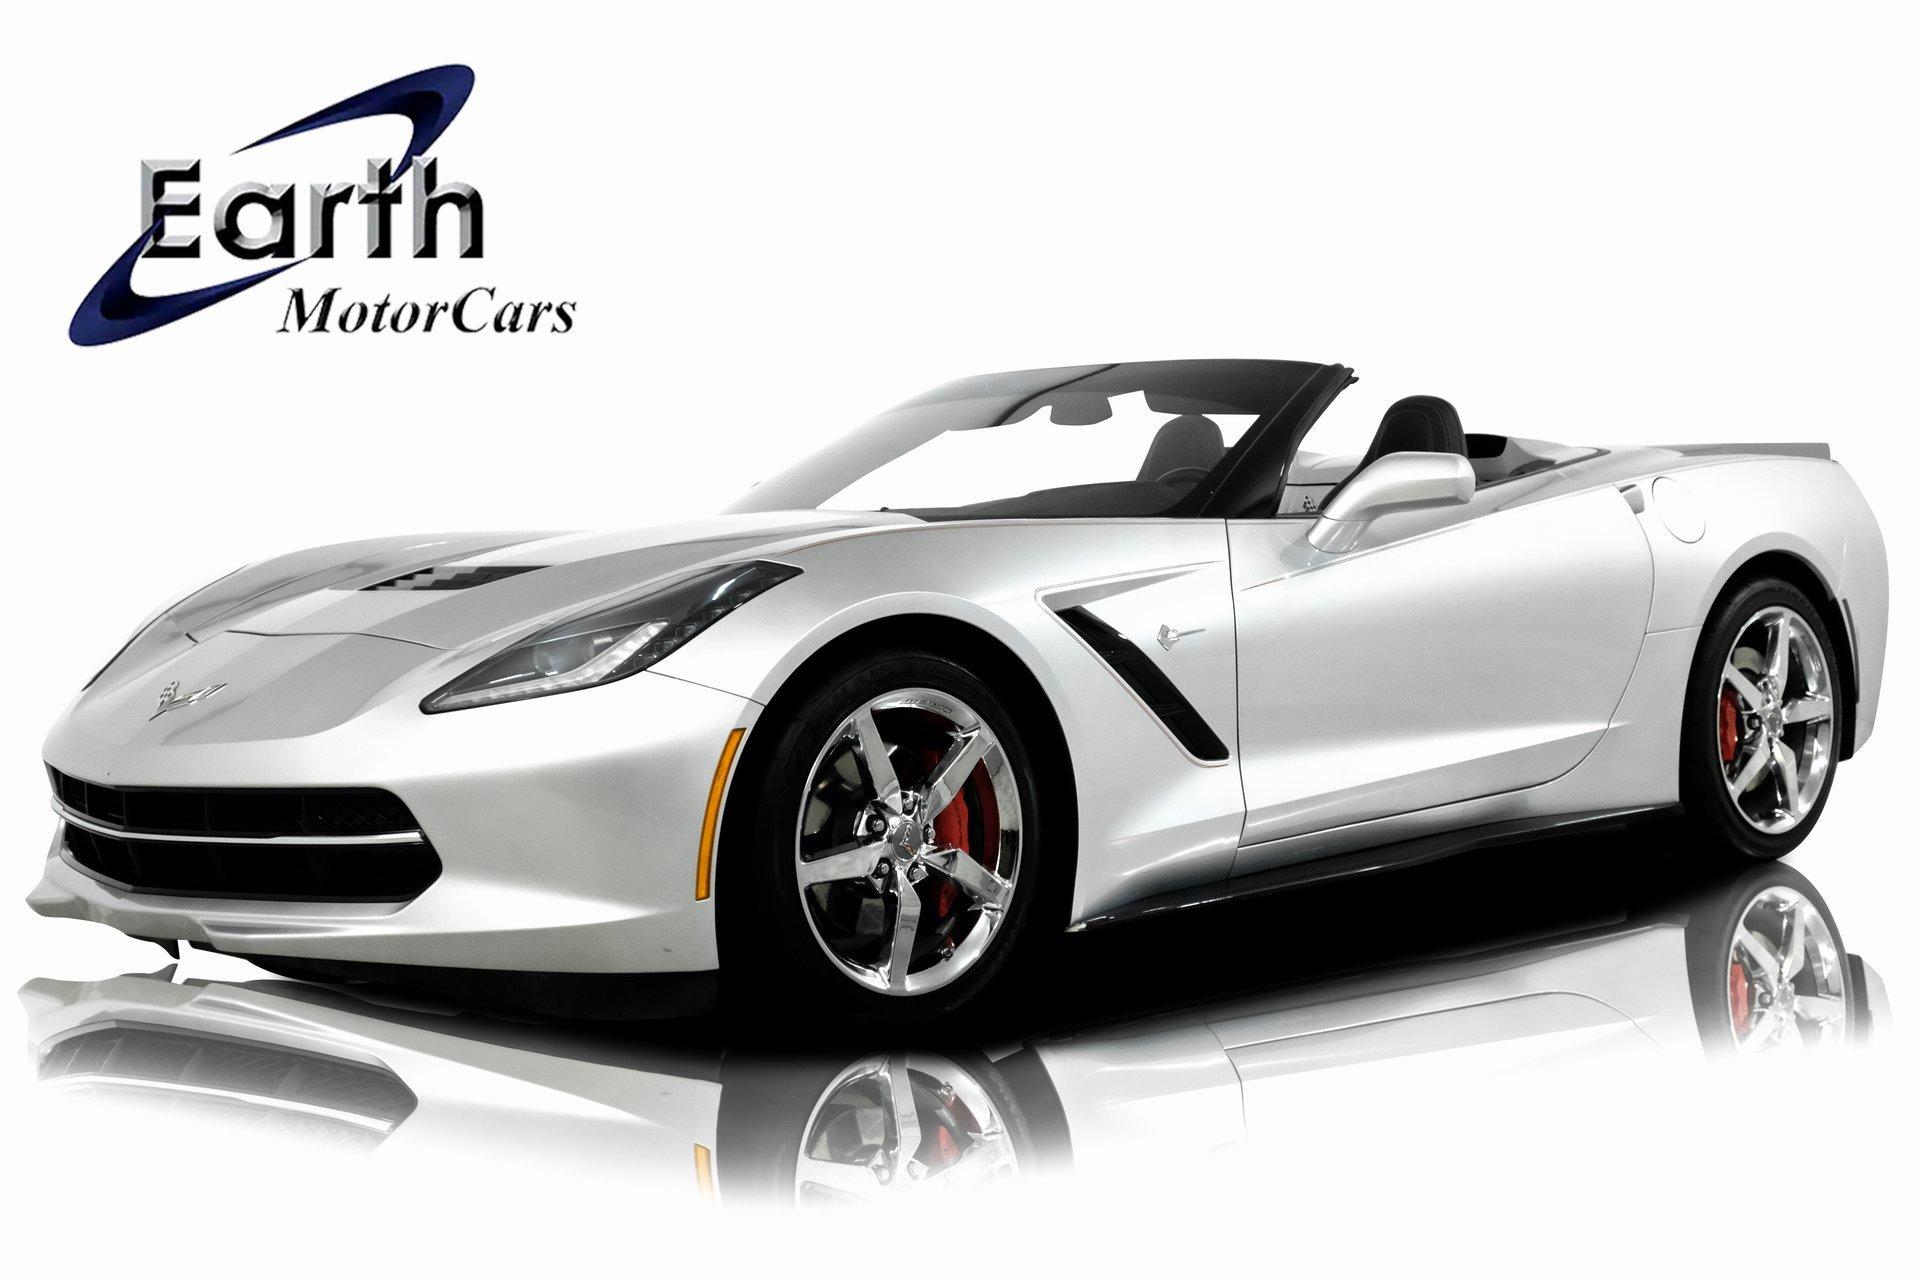 2014 Chevrolet Corvette Stingray Convertible image